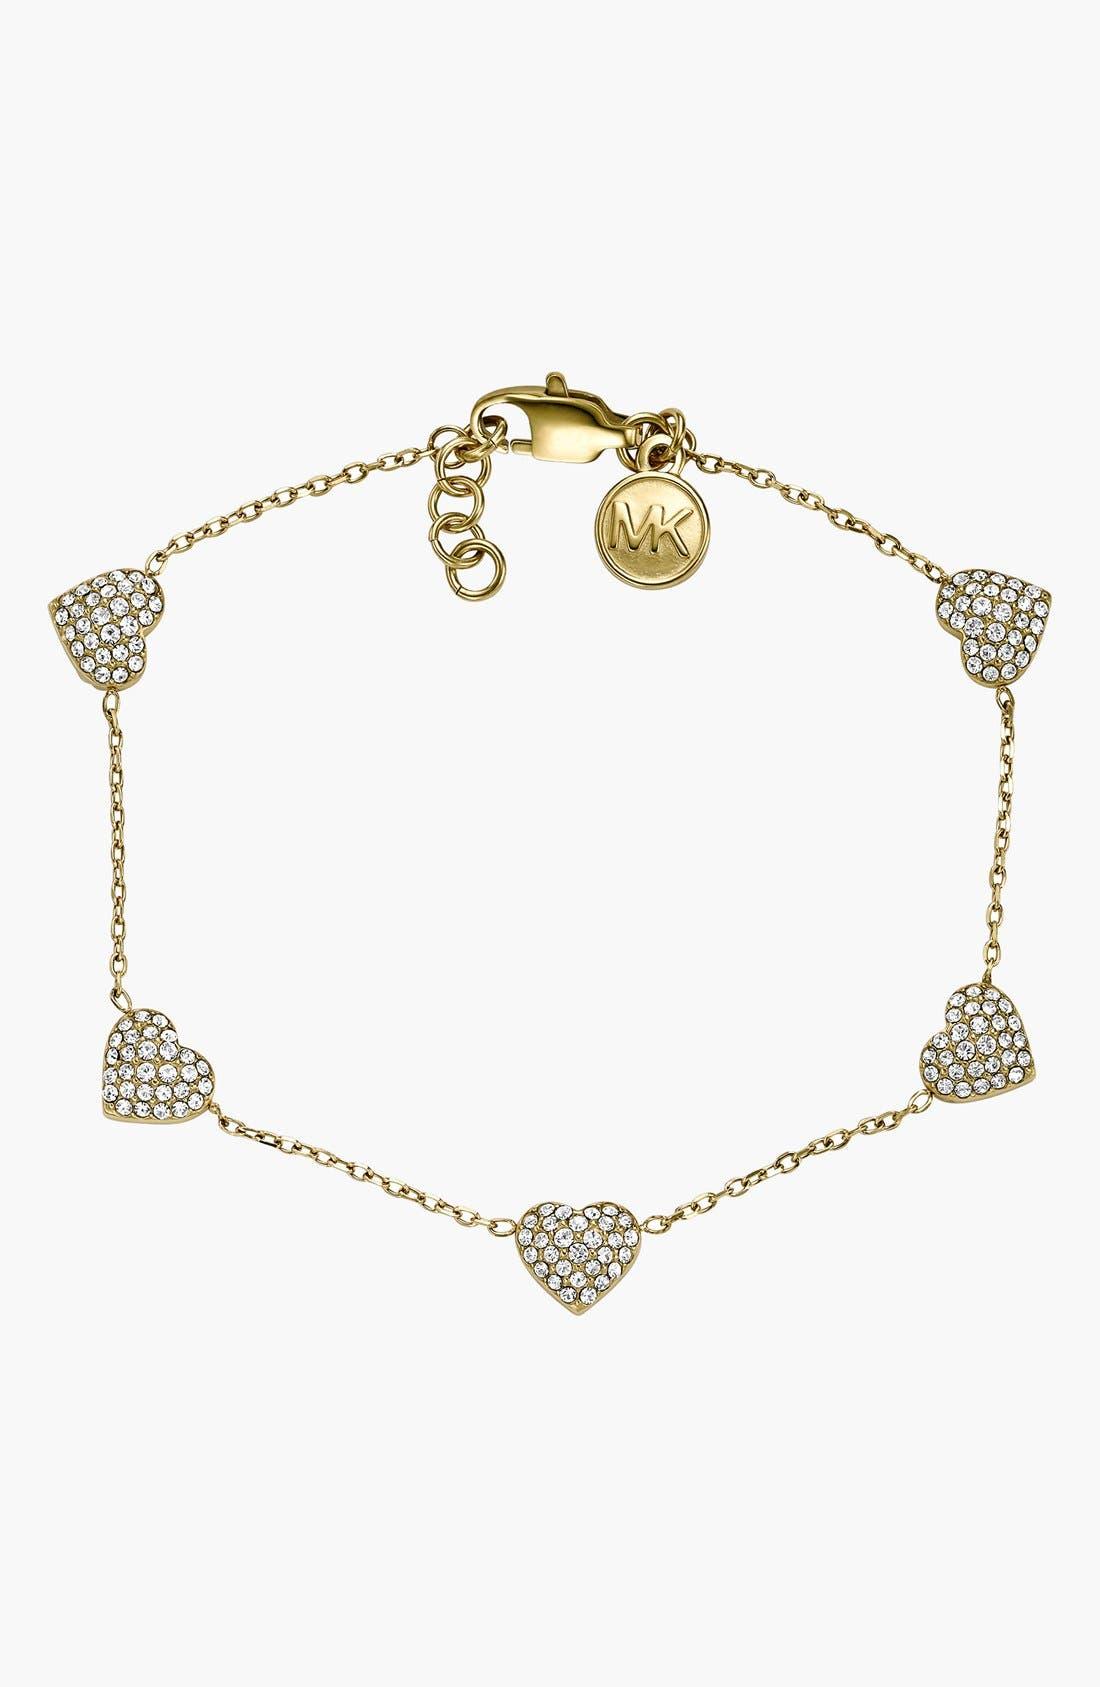 Main Image - Michael Kors 'Motif Brilliance' Pavé Heart Station Bracelet